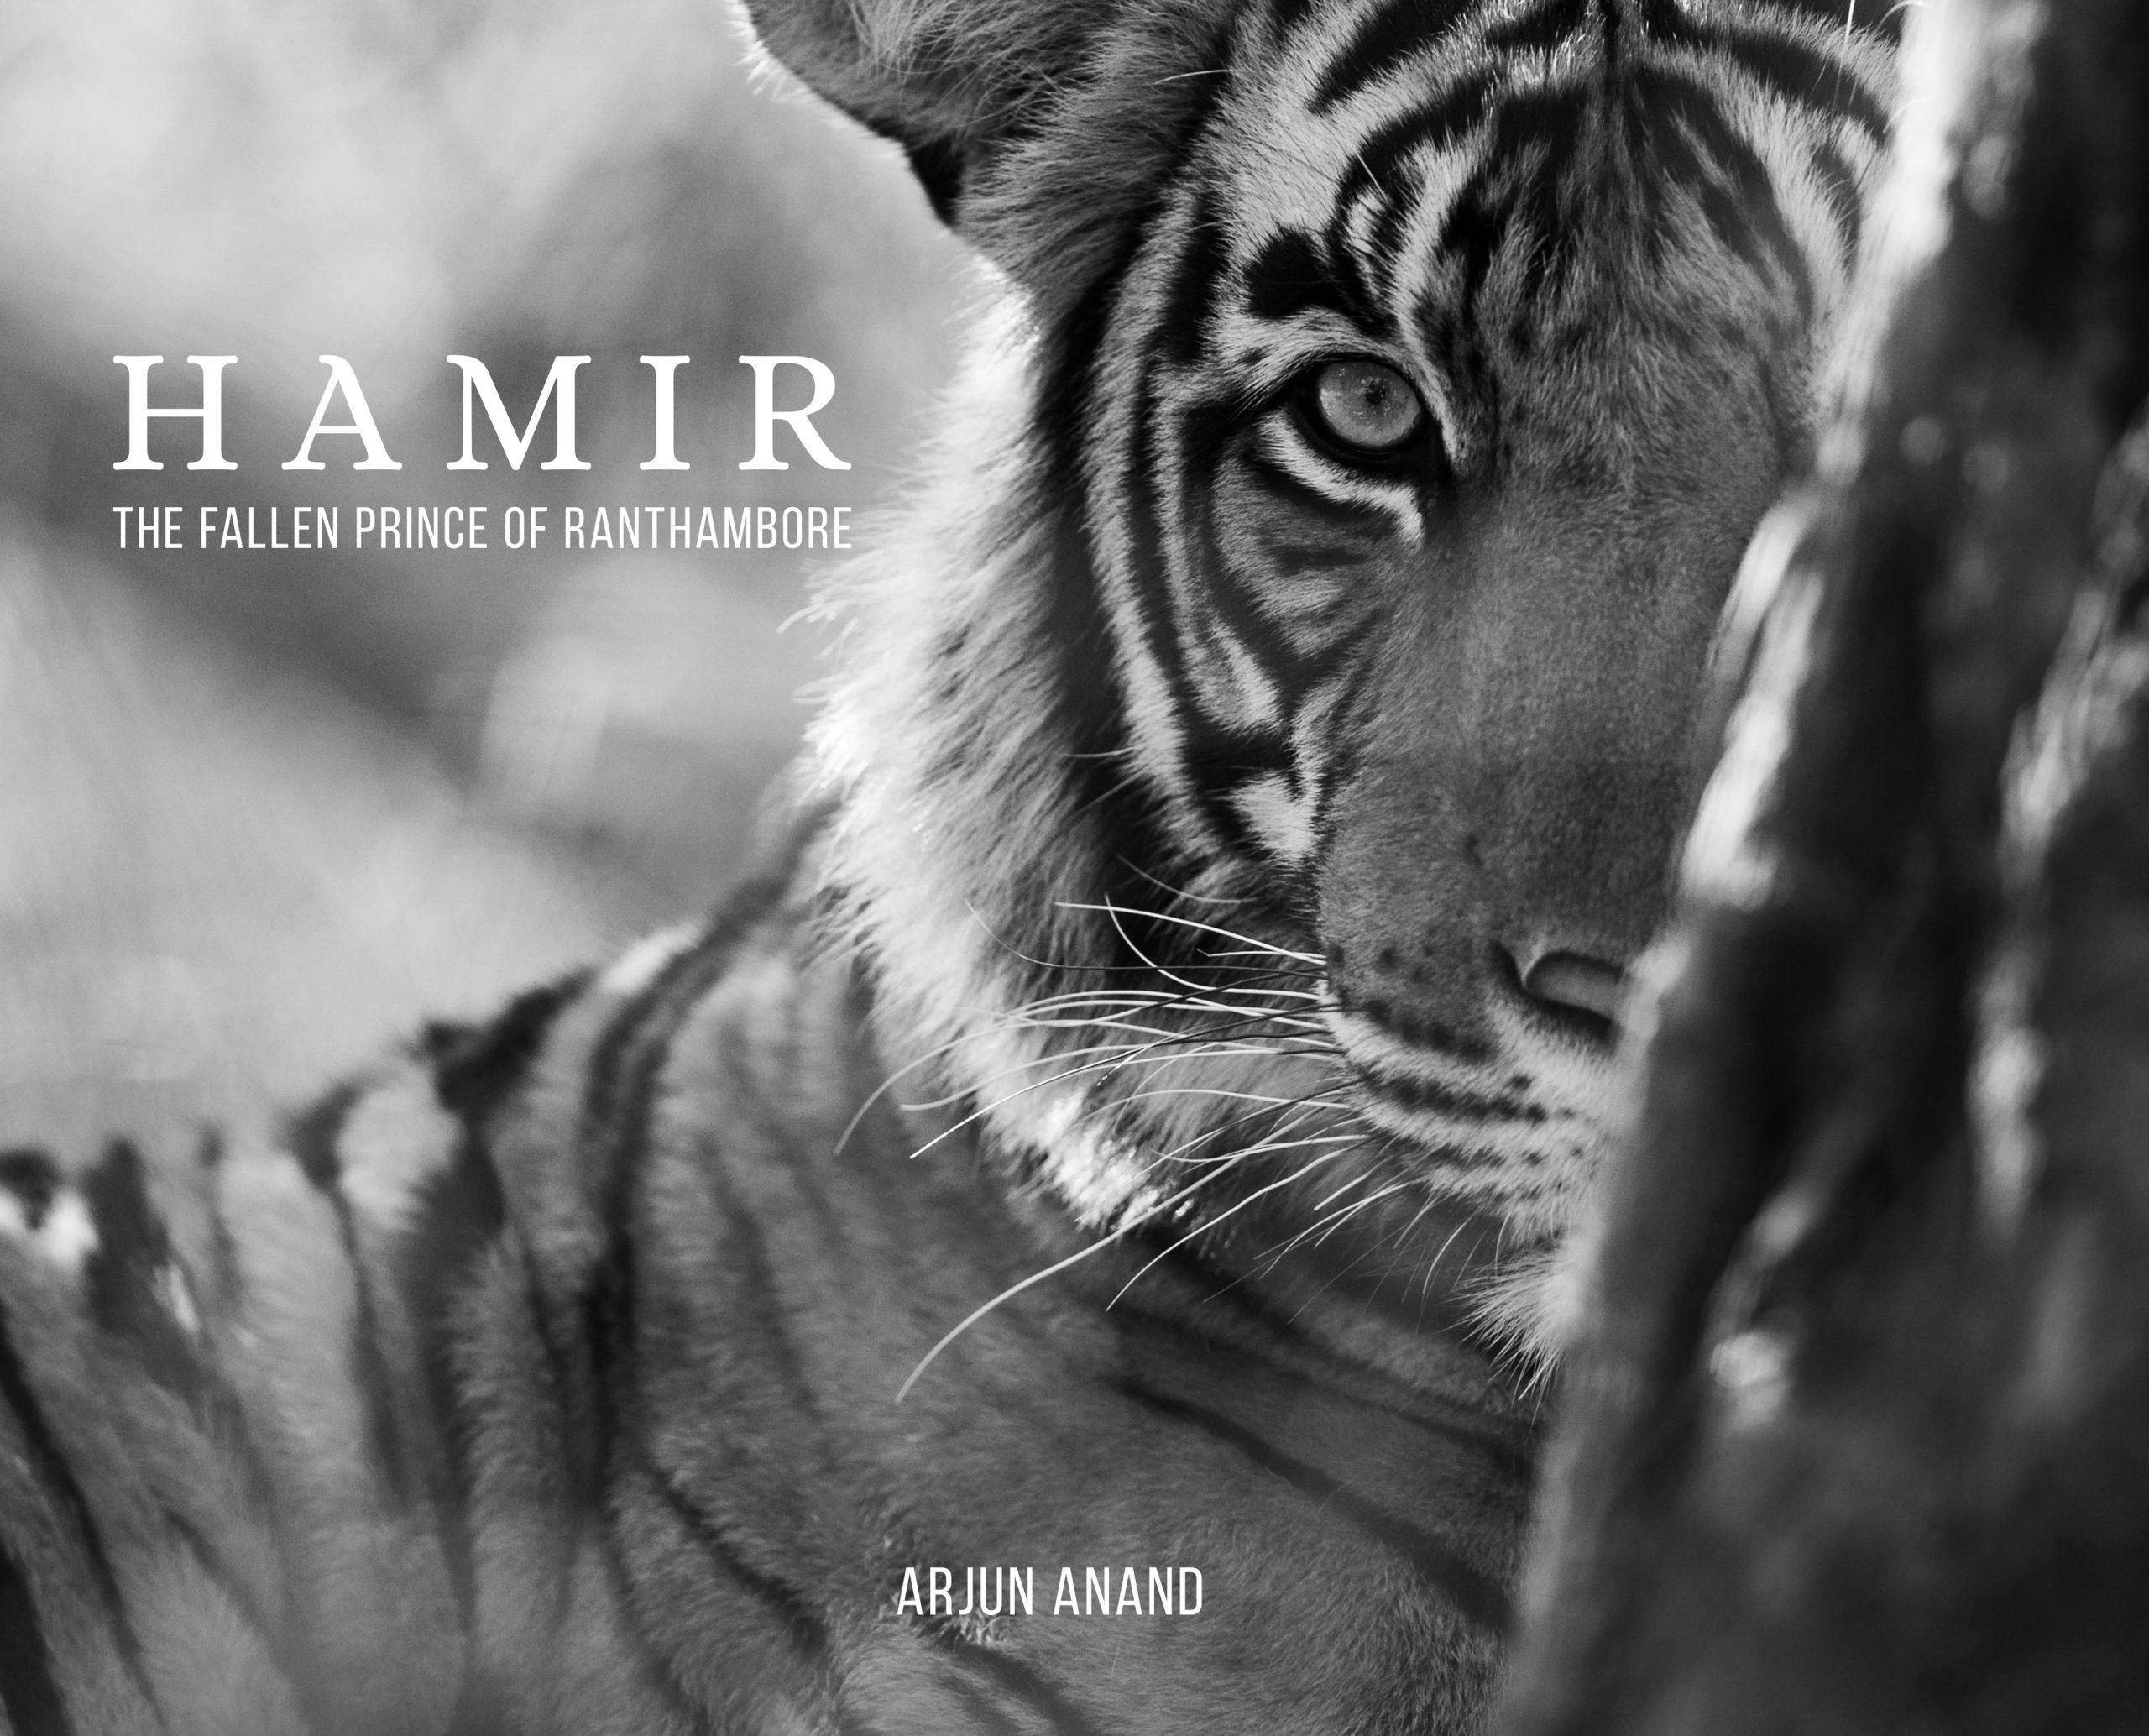 https://www.arjunanand.com/wp-content/uploads/2021/05/hamir-book-scaled.jpg